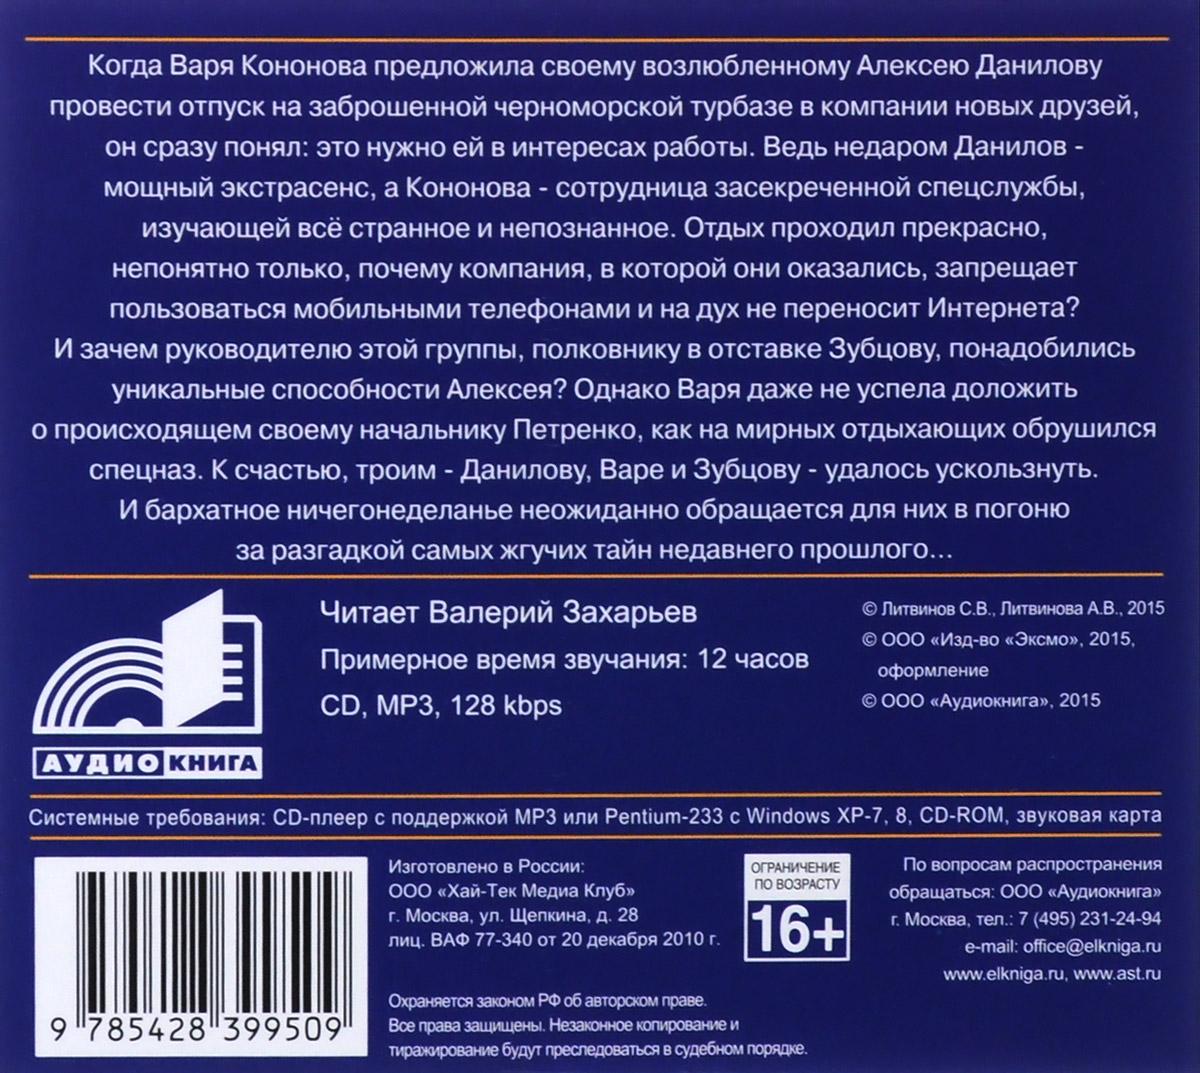 Аватар судьбы (аудиокнига CD)